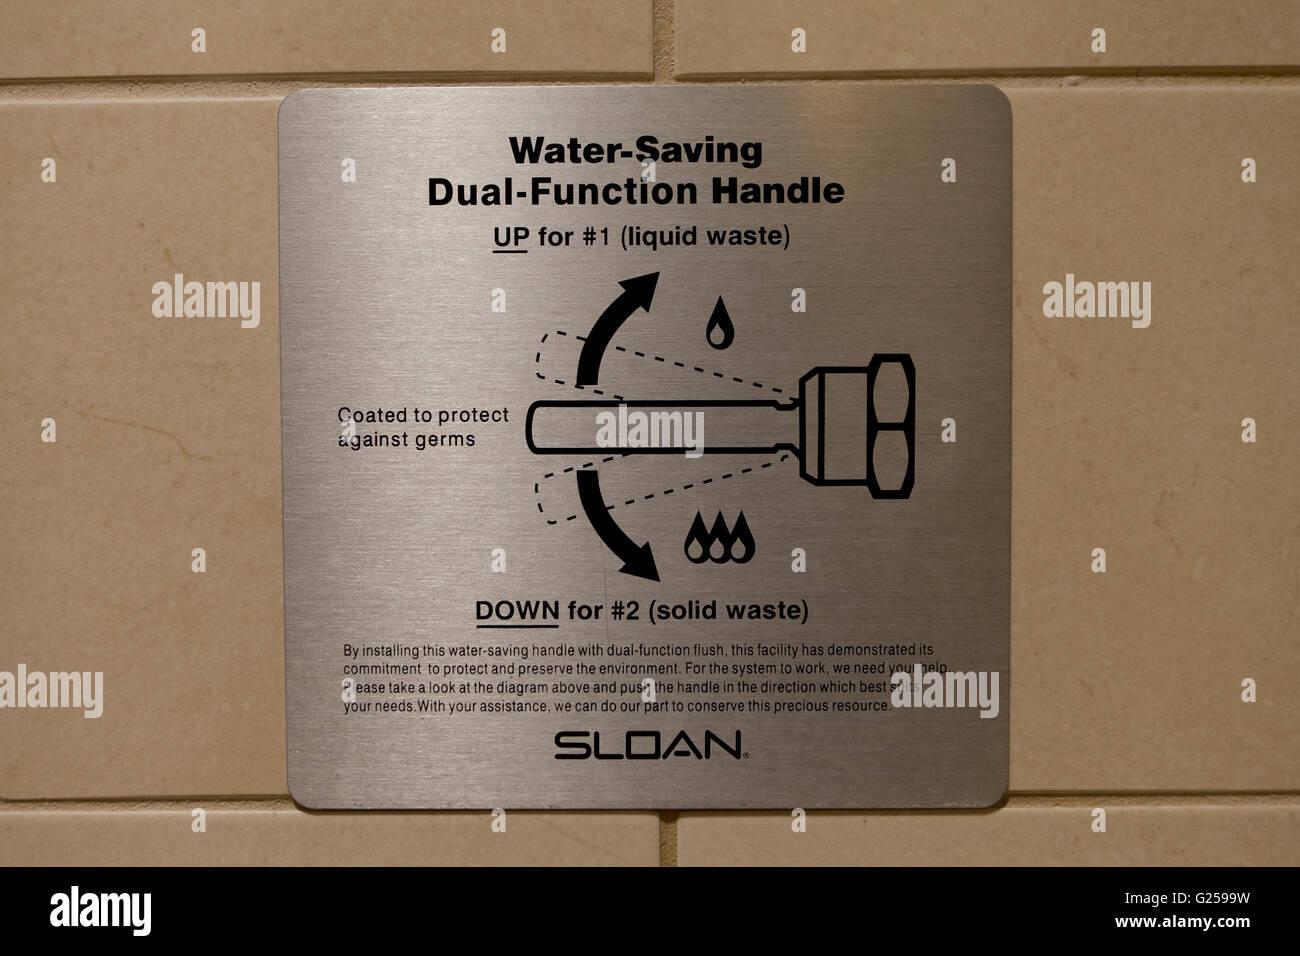 Water saving dual function public toilet handle notice - USA - Stock Image